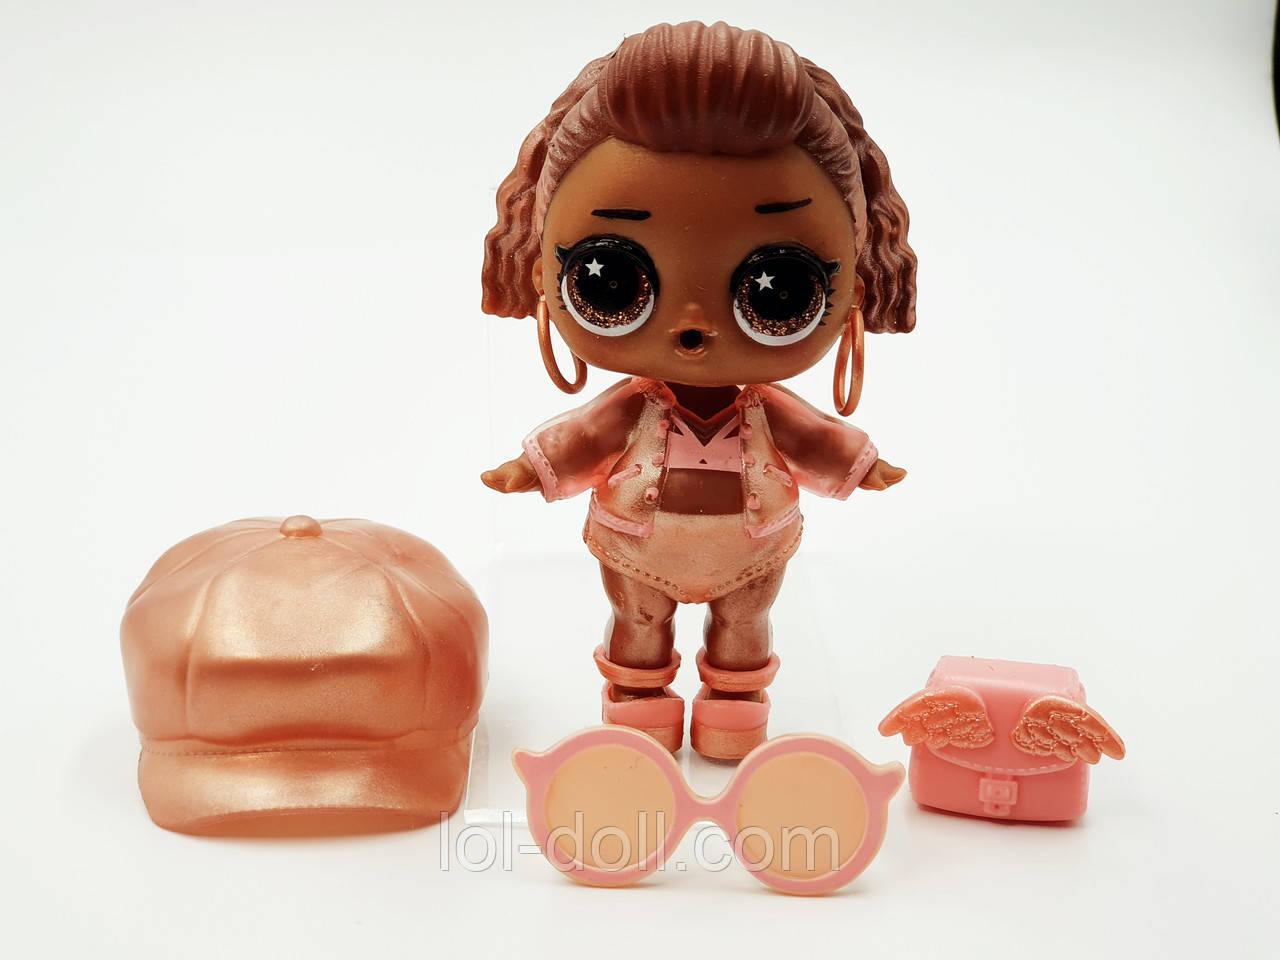 Кукла LOL Surprise Special Series Instagold  Лол Сюрприз Без Шара Оригинал